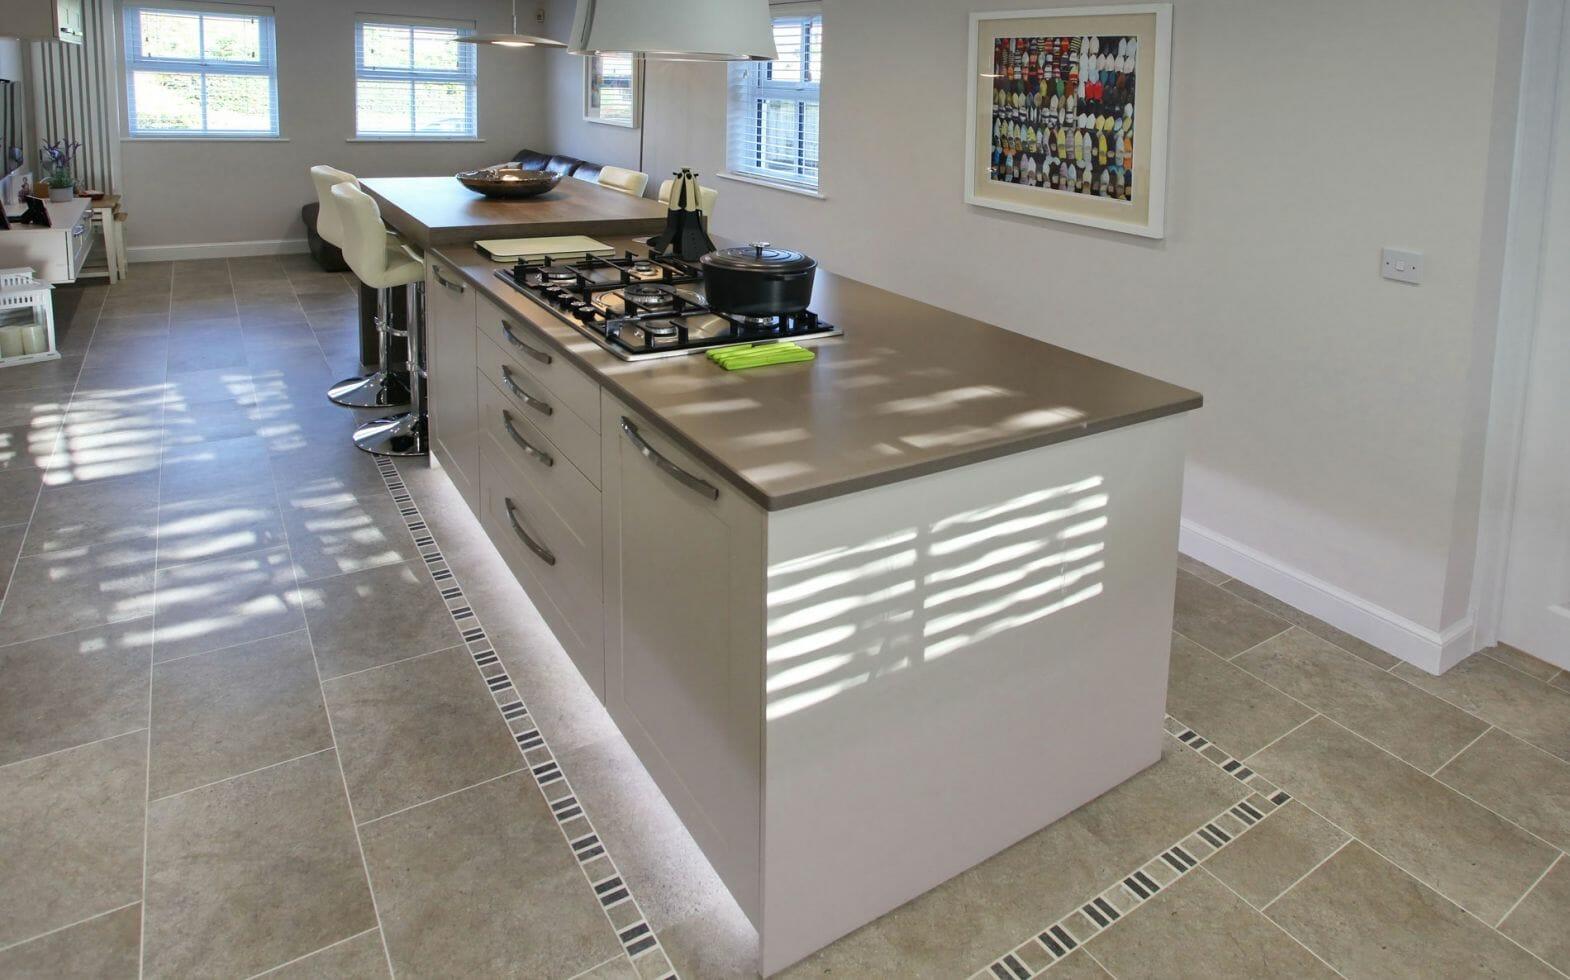 Kitchen example 3